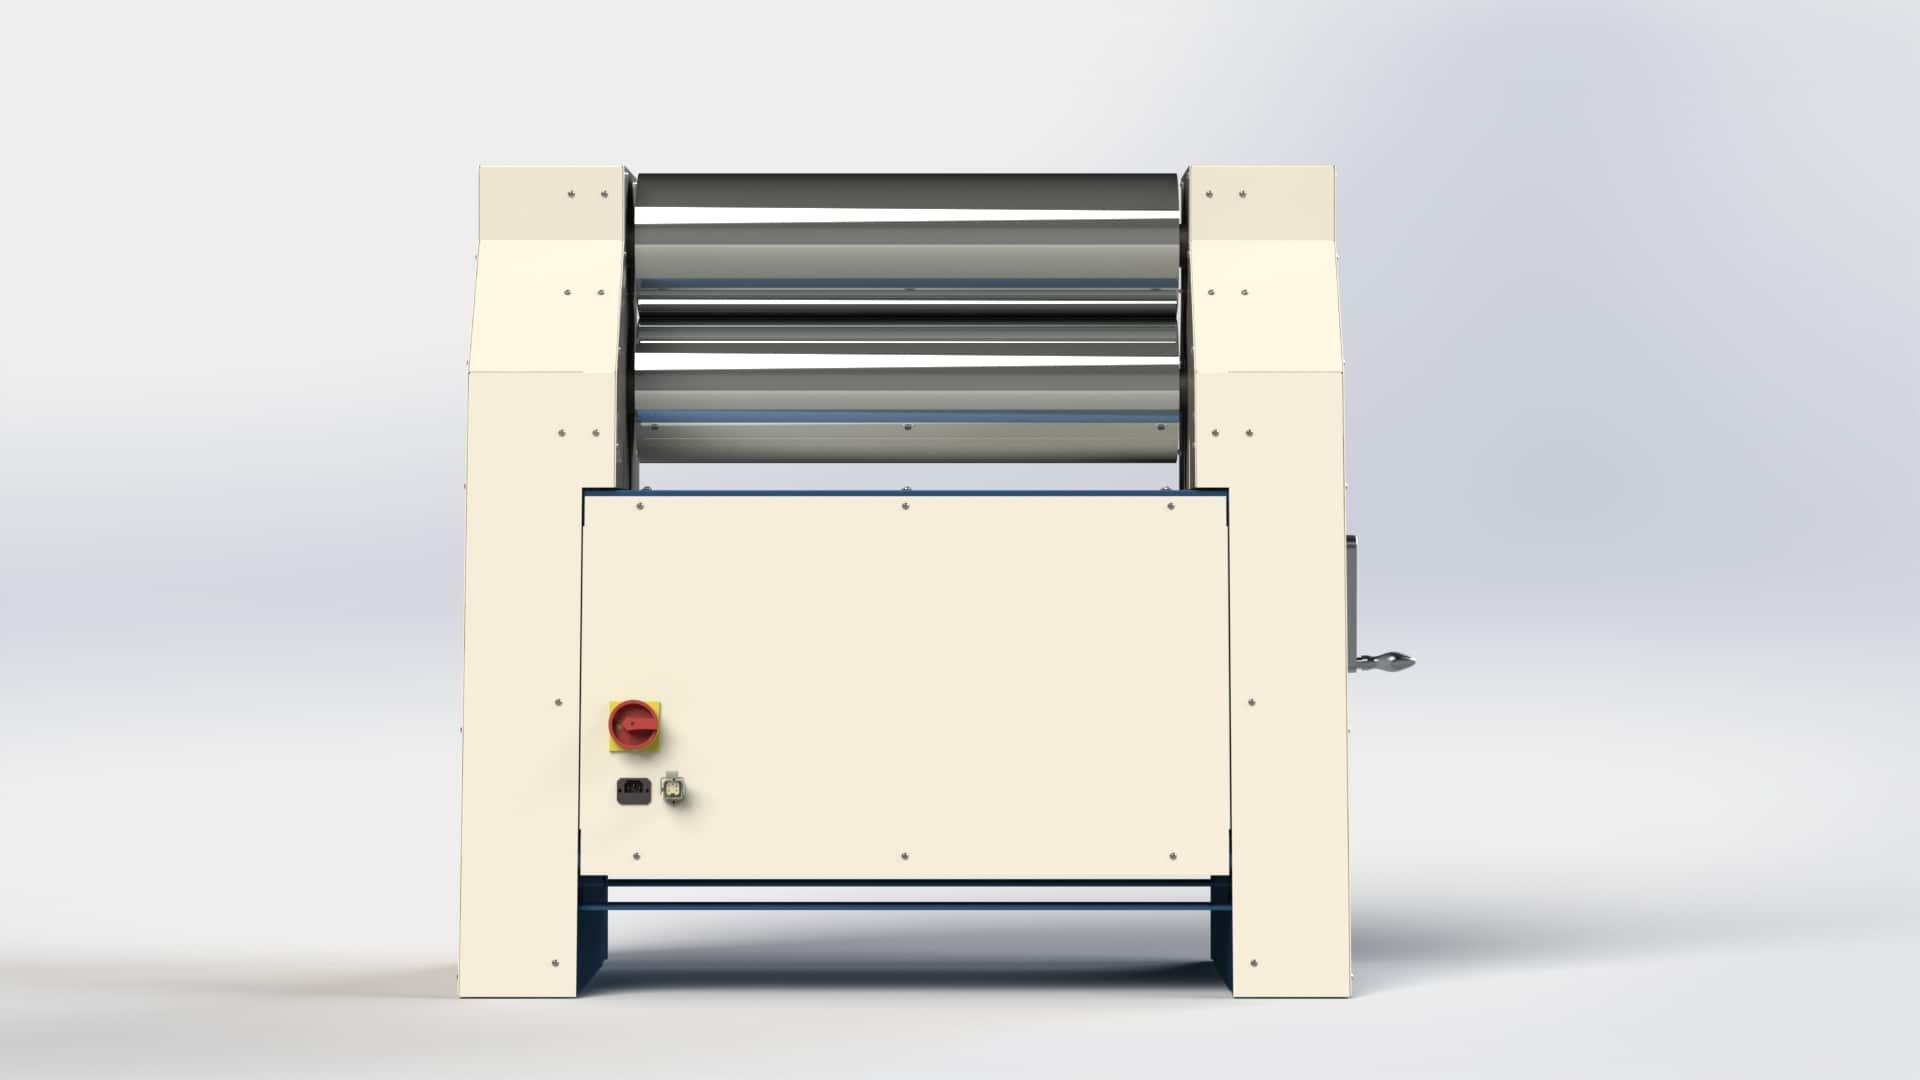 Dijatec siliconenwals MW-20